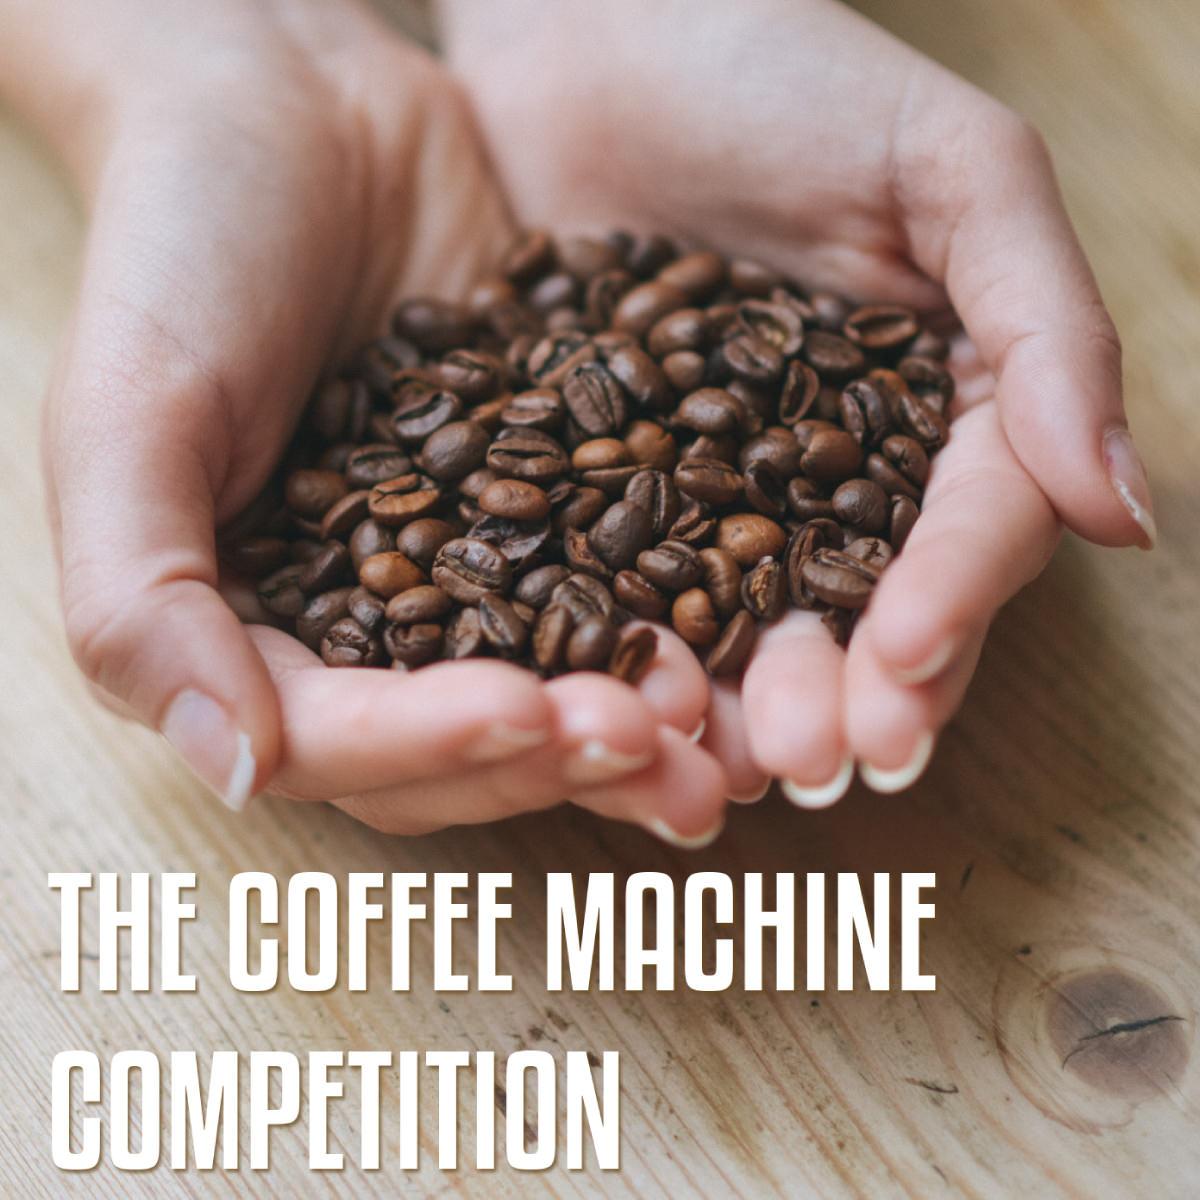 Coffee_image-size-promo_1200x1200